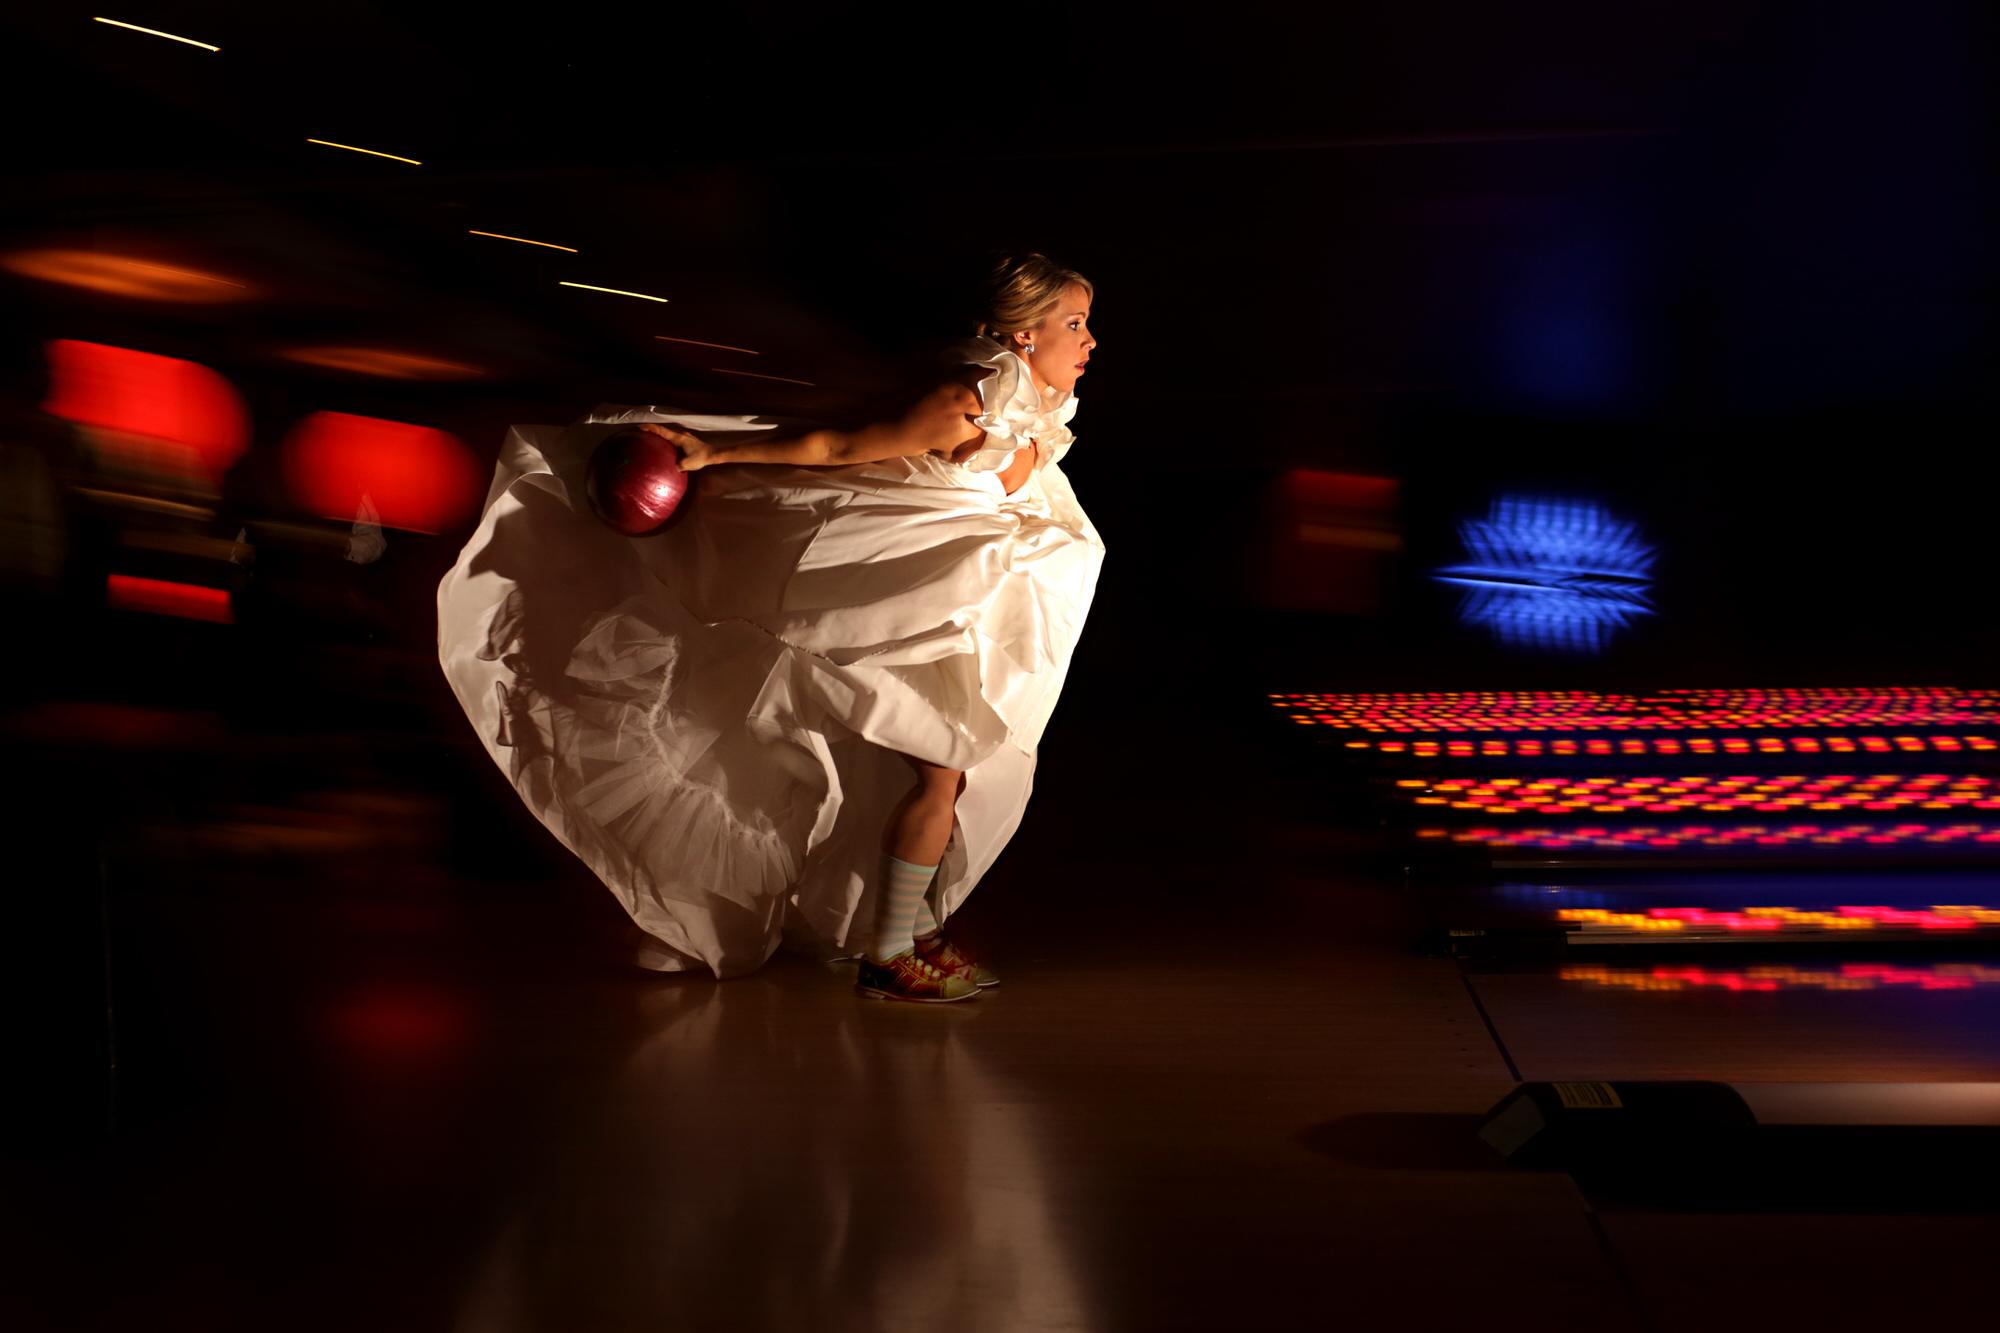 Bride bowling photo by Tyler Wirken - Kansas City